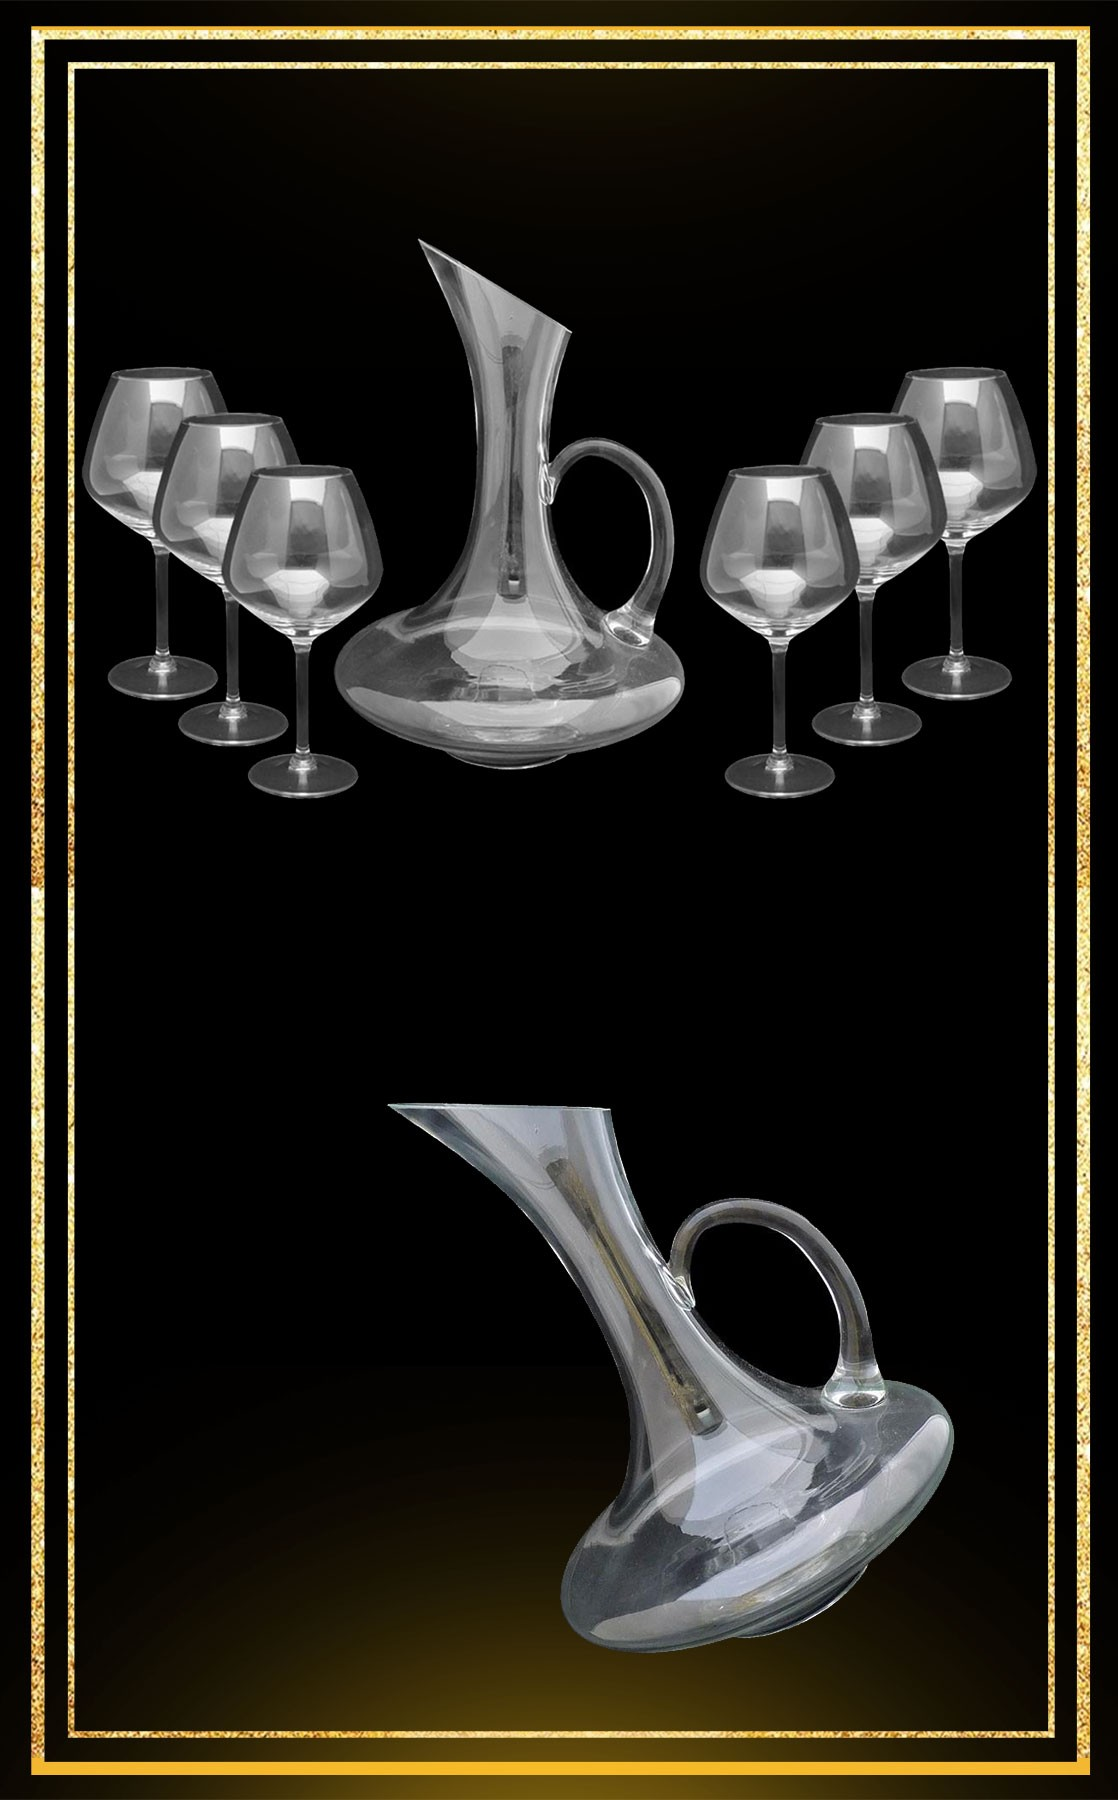 Service carafe Bouquet verres Virtuosa 42cl